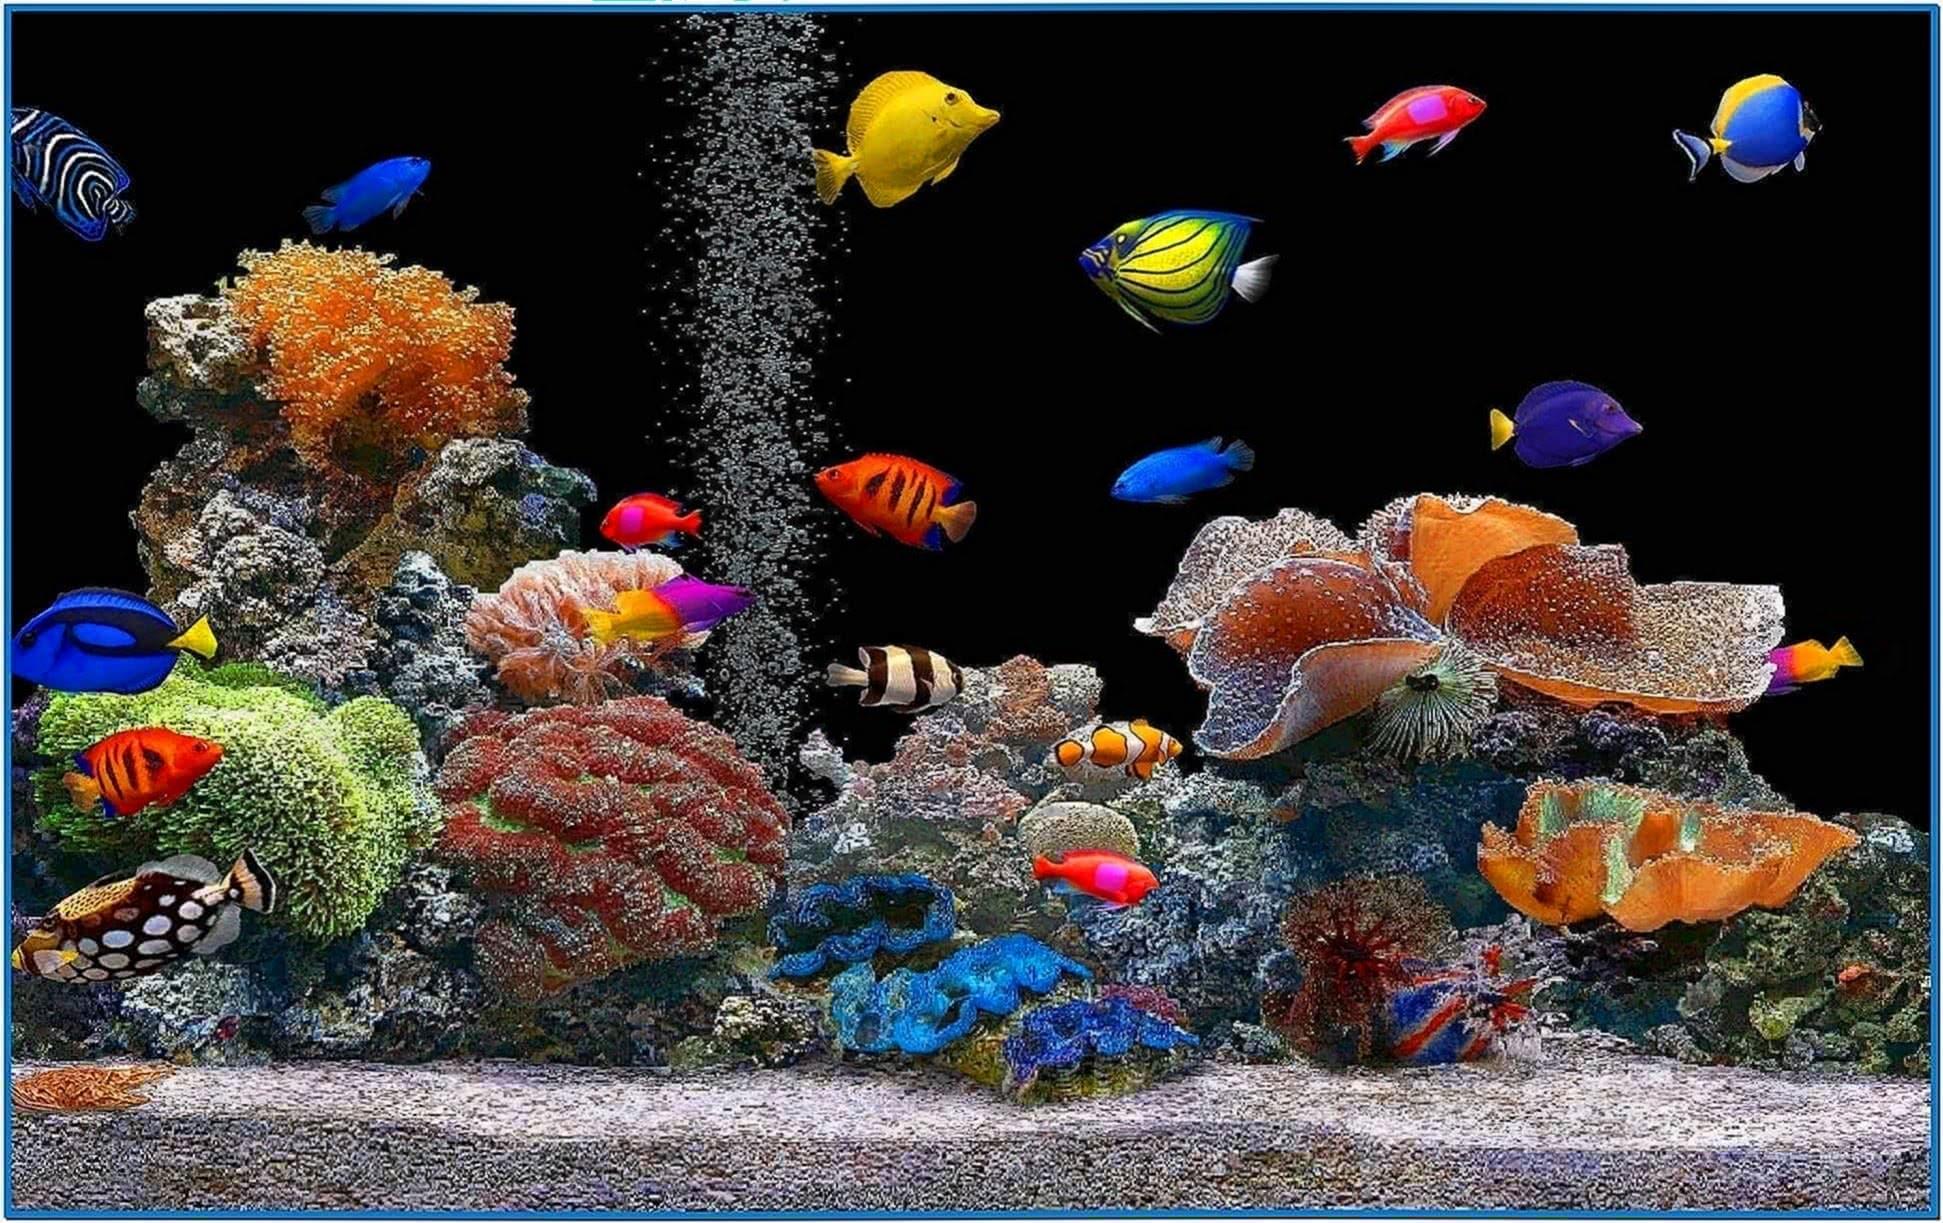 Marine Aquarium Screensaver HD